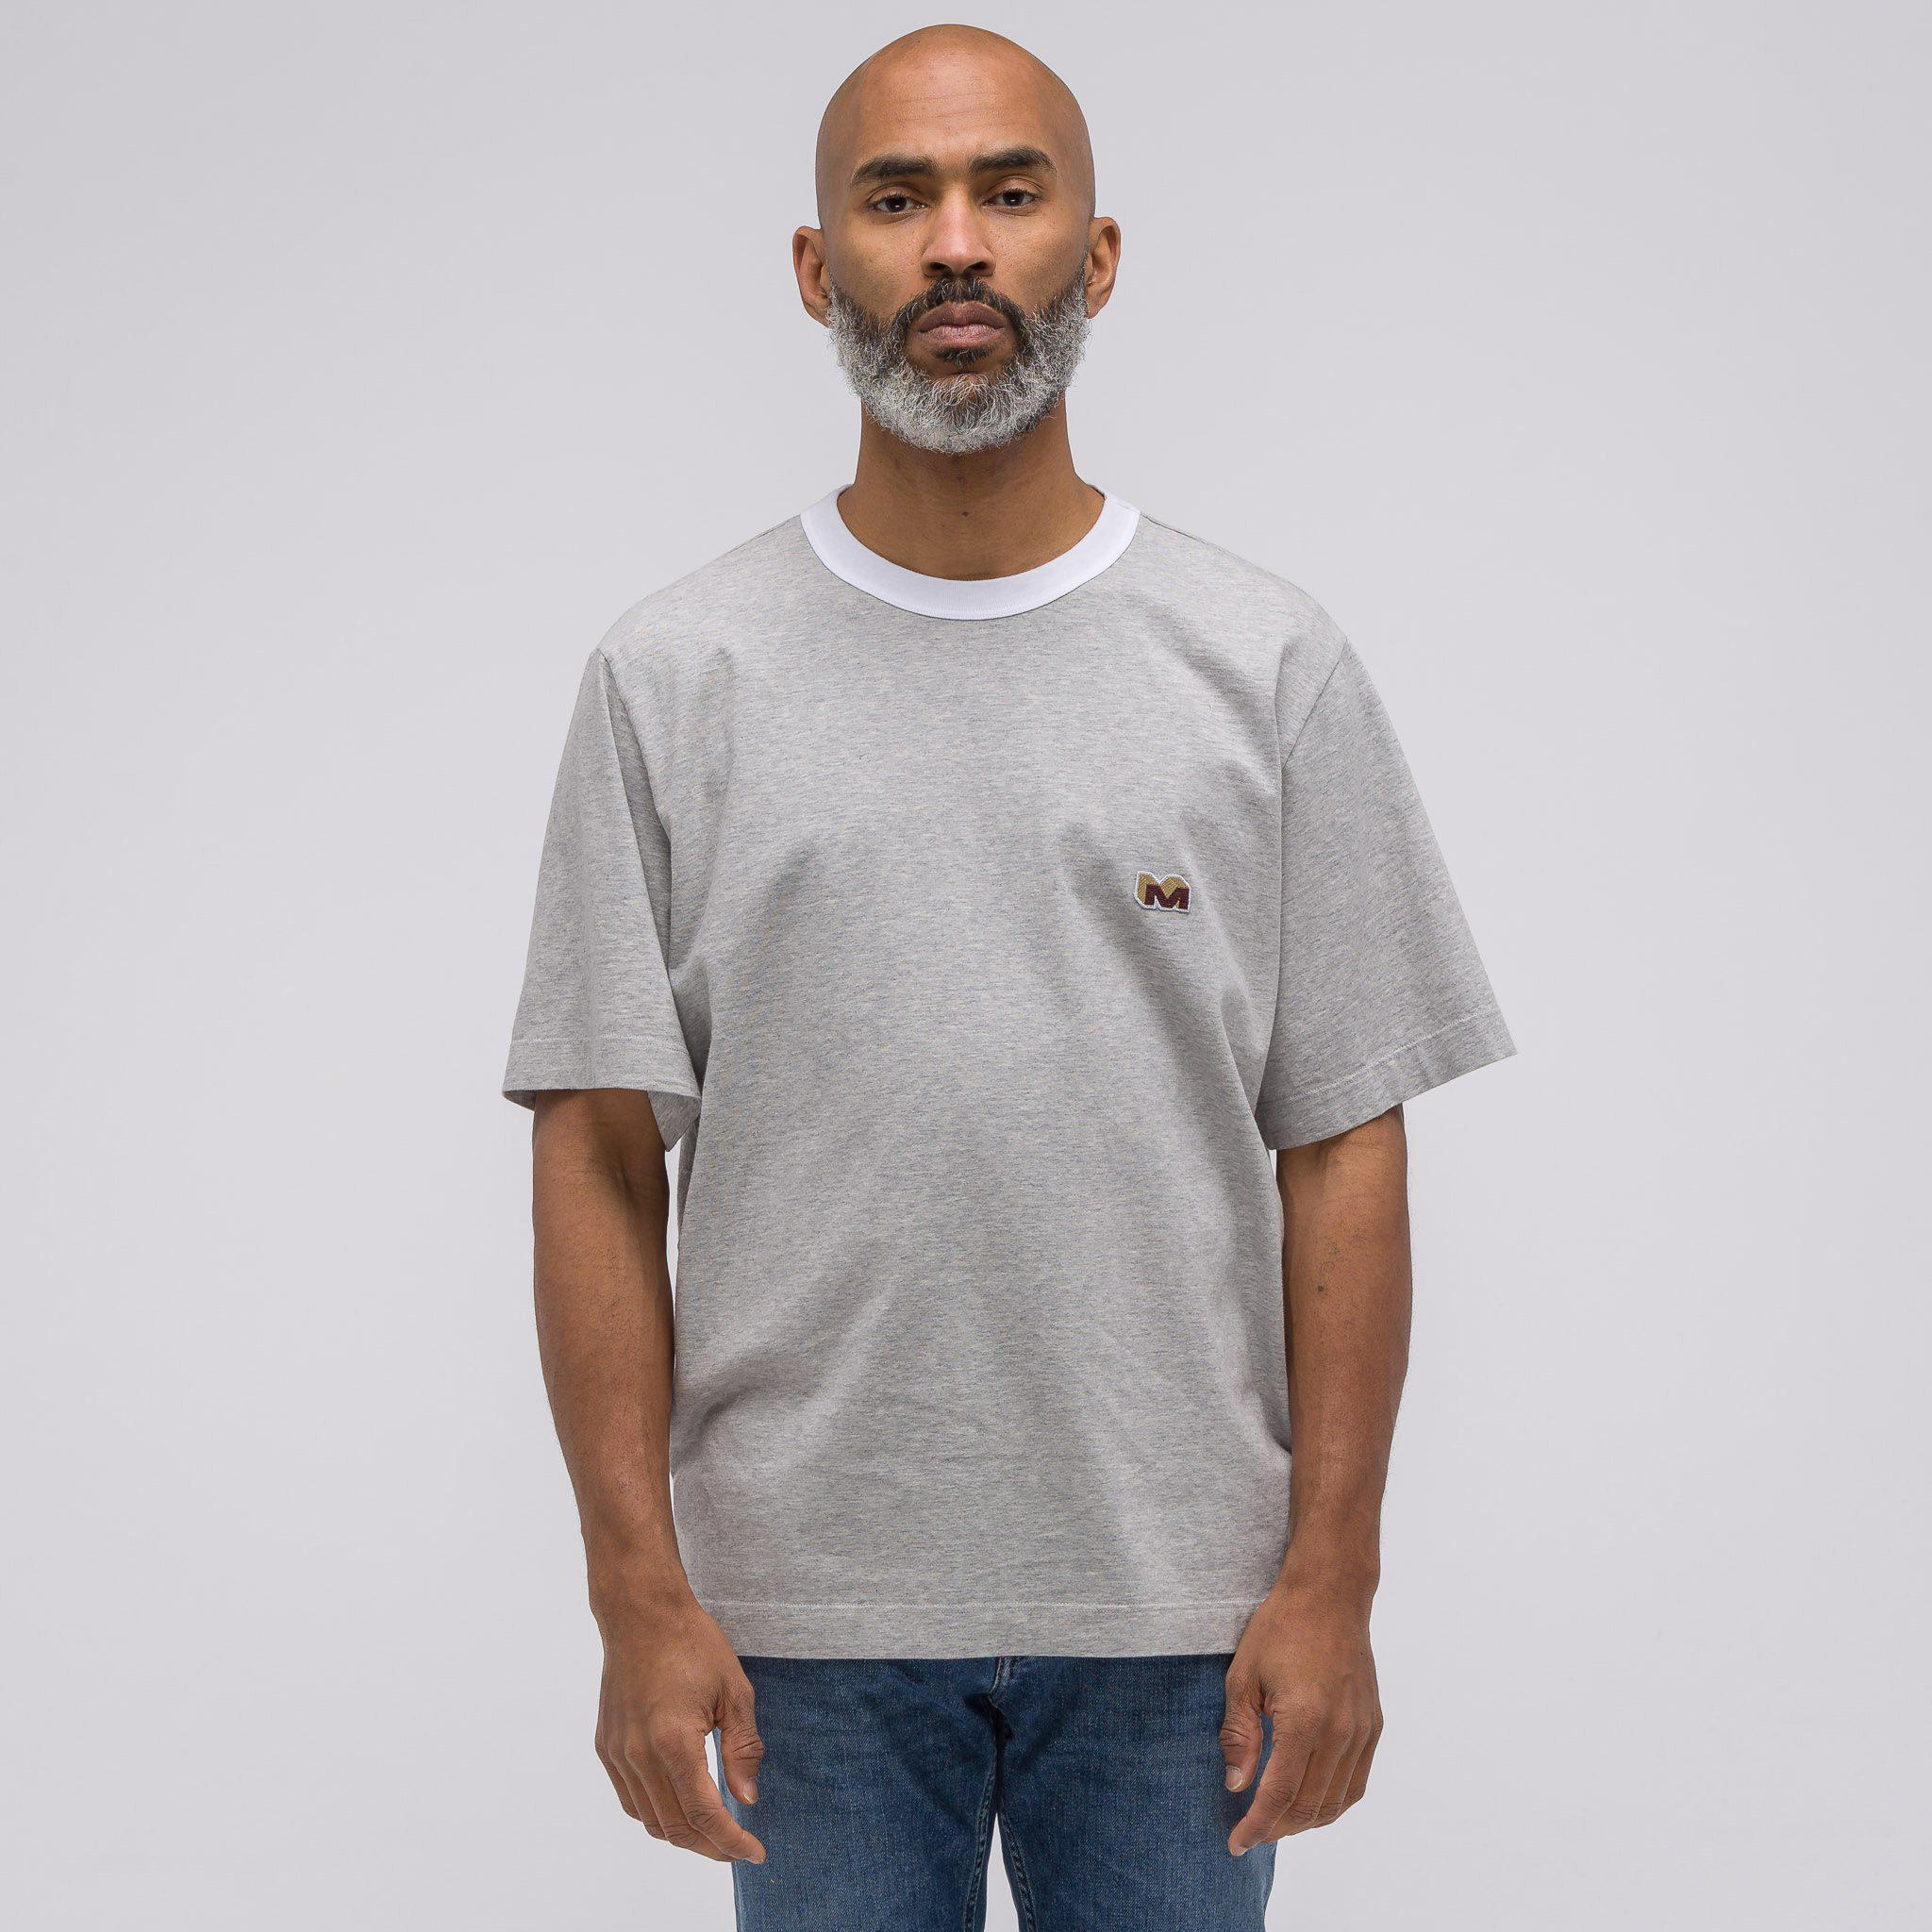 Marni. Men's Gray Short Sleeve T-shirt In Grey Melange